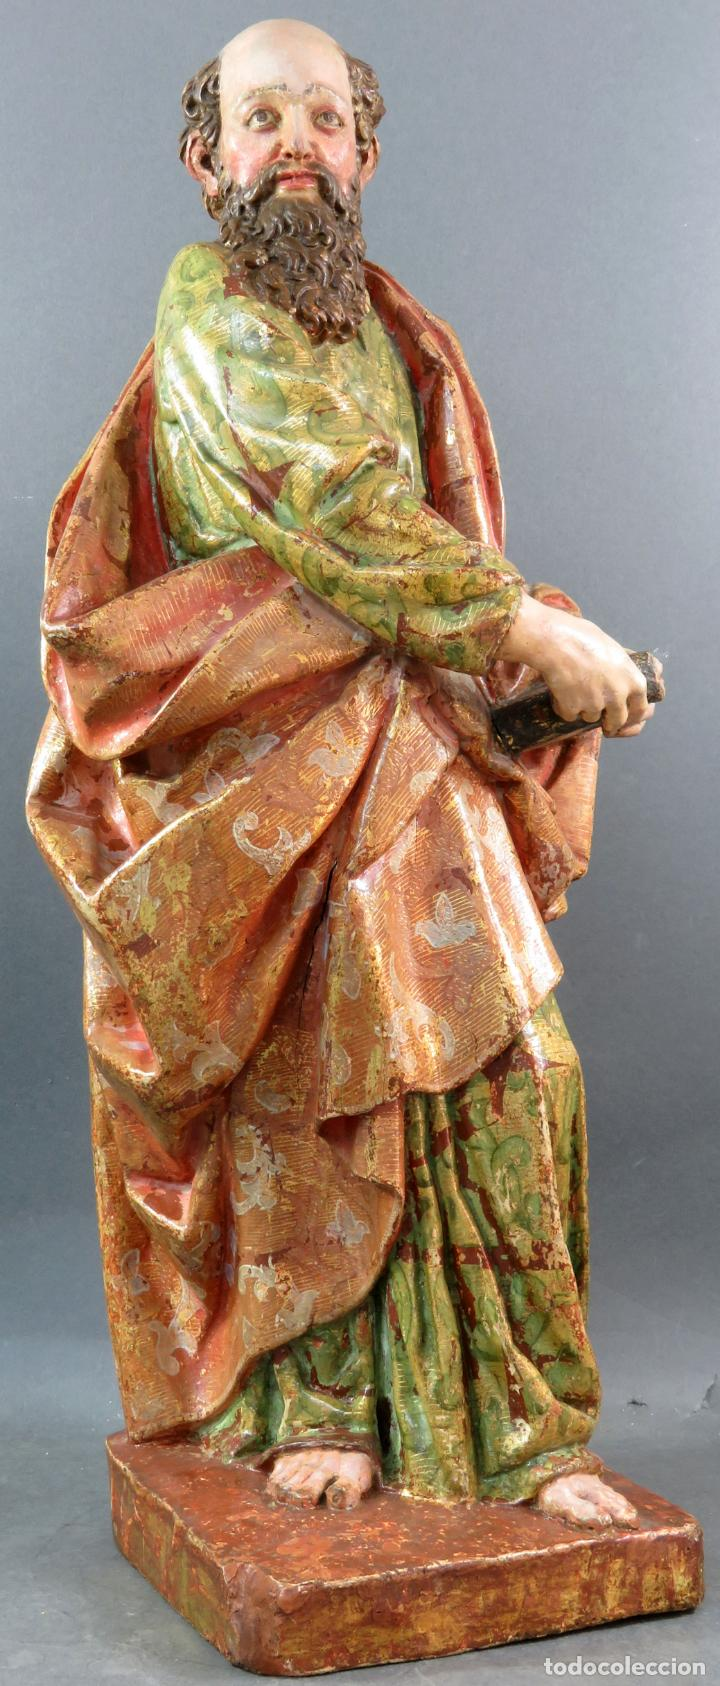 Arte: Talla San Pablo en madera estofada dorada policromada seguidor Gregorio Fernández siglo XVI - Foto 3 - 159655670